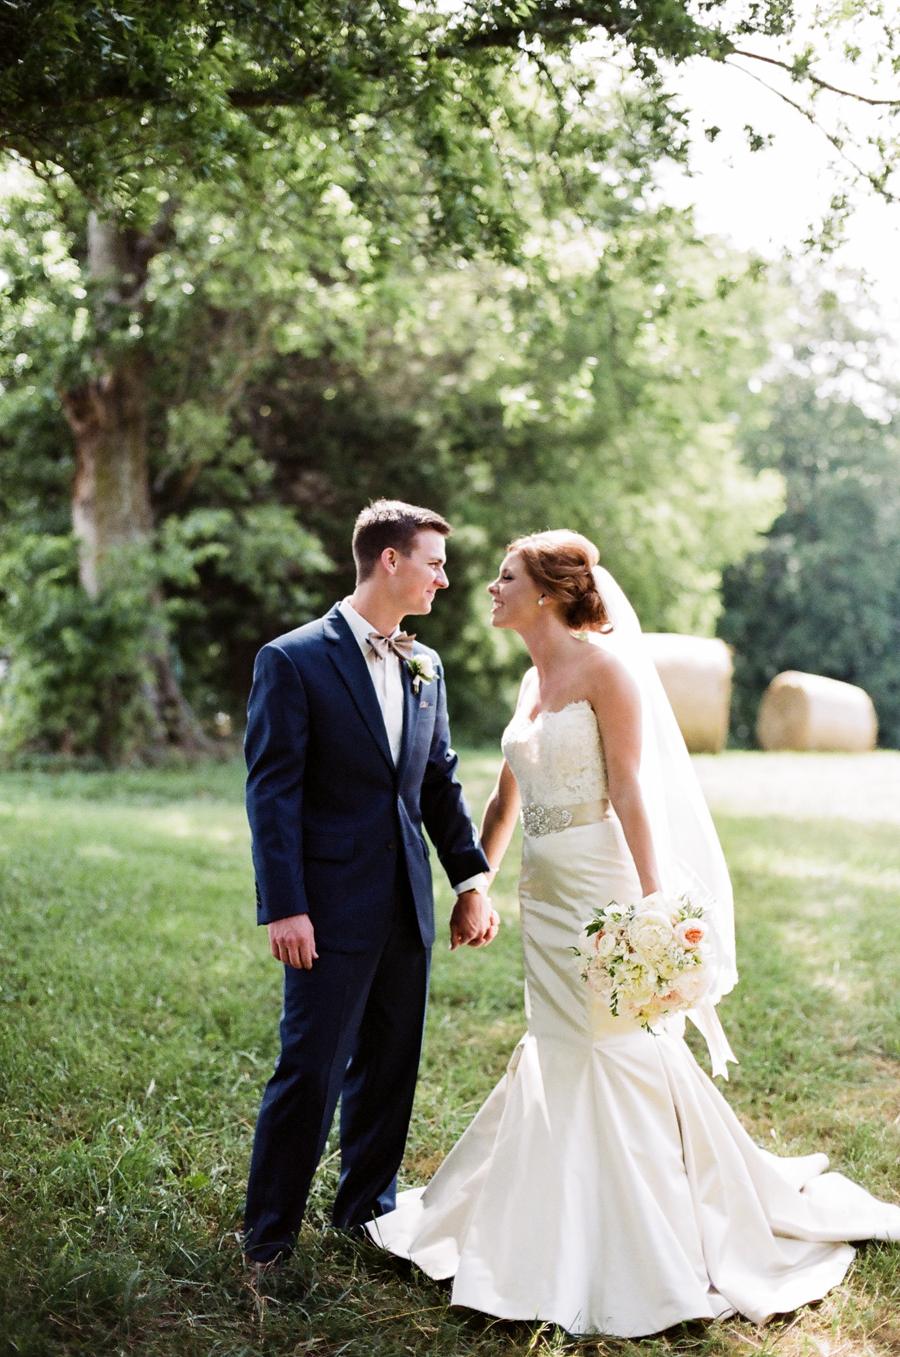 Nashville-wedding-photographer-best-wedding-photography-71.JPG